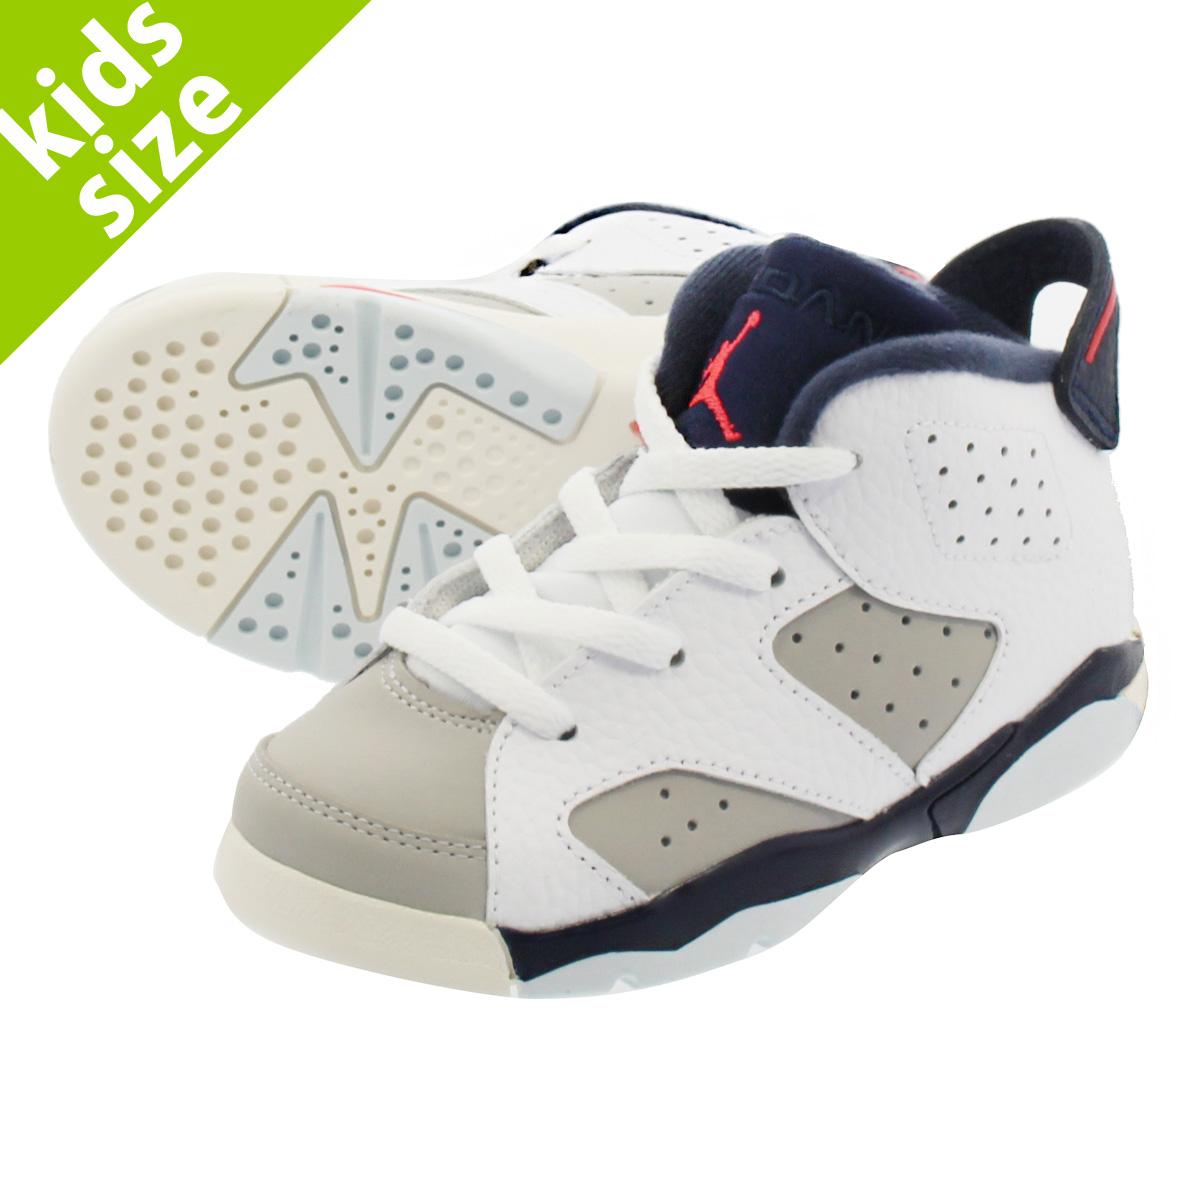 e985c4caf3b6 NIKE AIR JORDAN 6 RETRO BT Nike Air Jordan 6 nostalgic BT WHITE INFRARED  23 NEUTRAL GREY OBSIDIAN 384